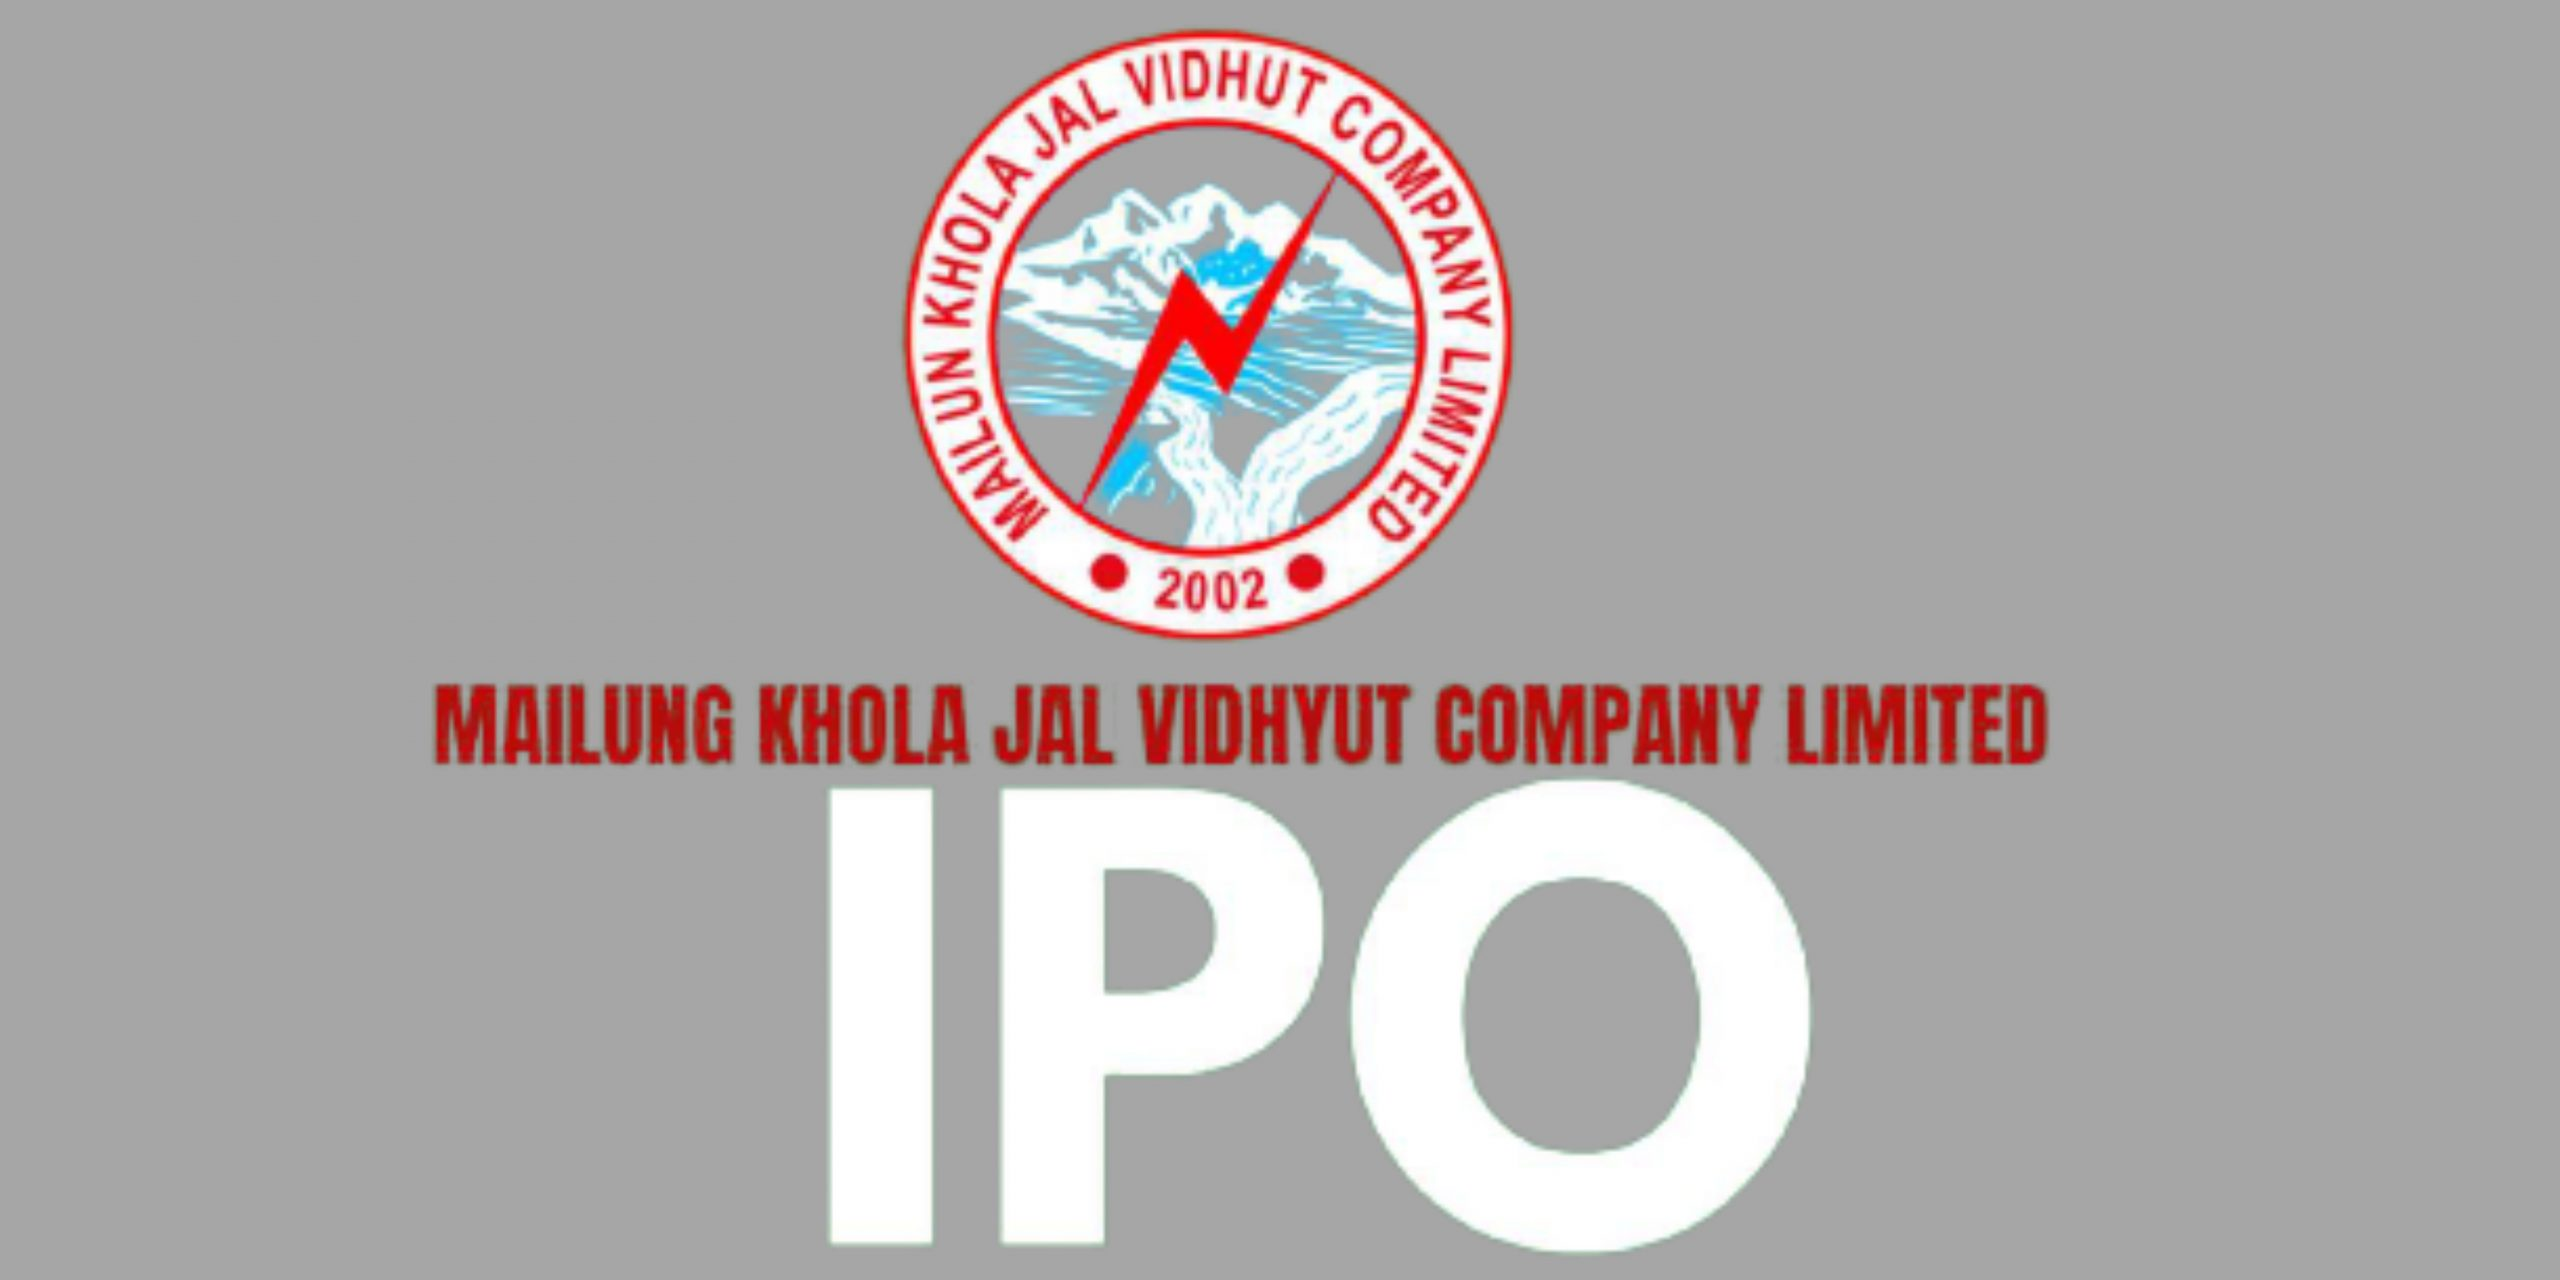 Mailung Khola Javidhyut Company Limited IPO